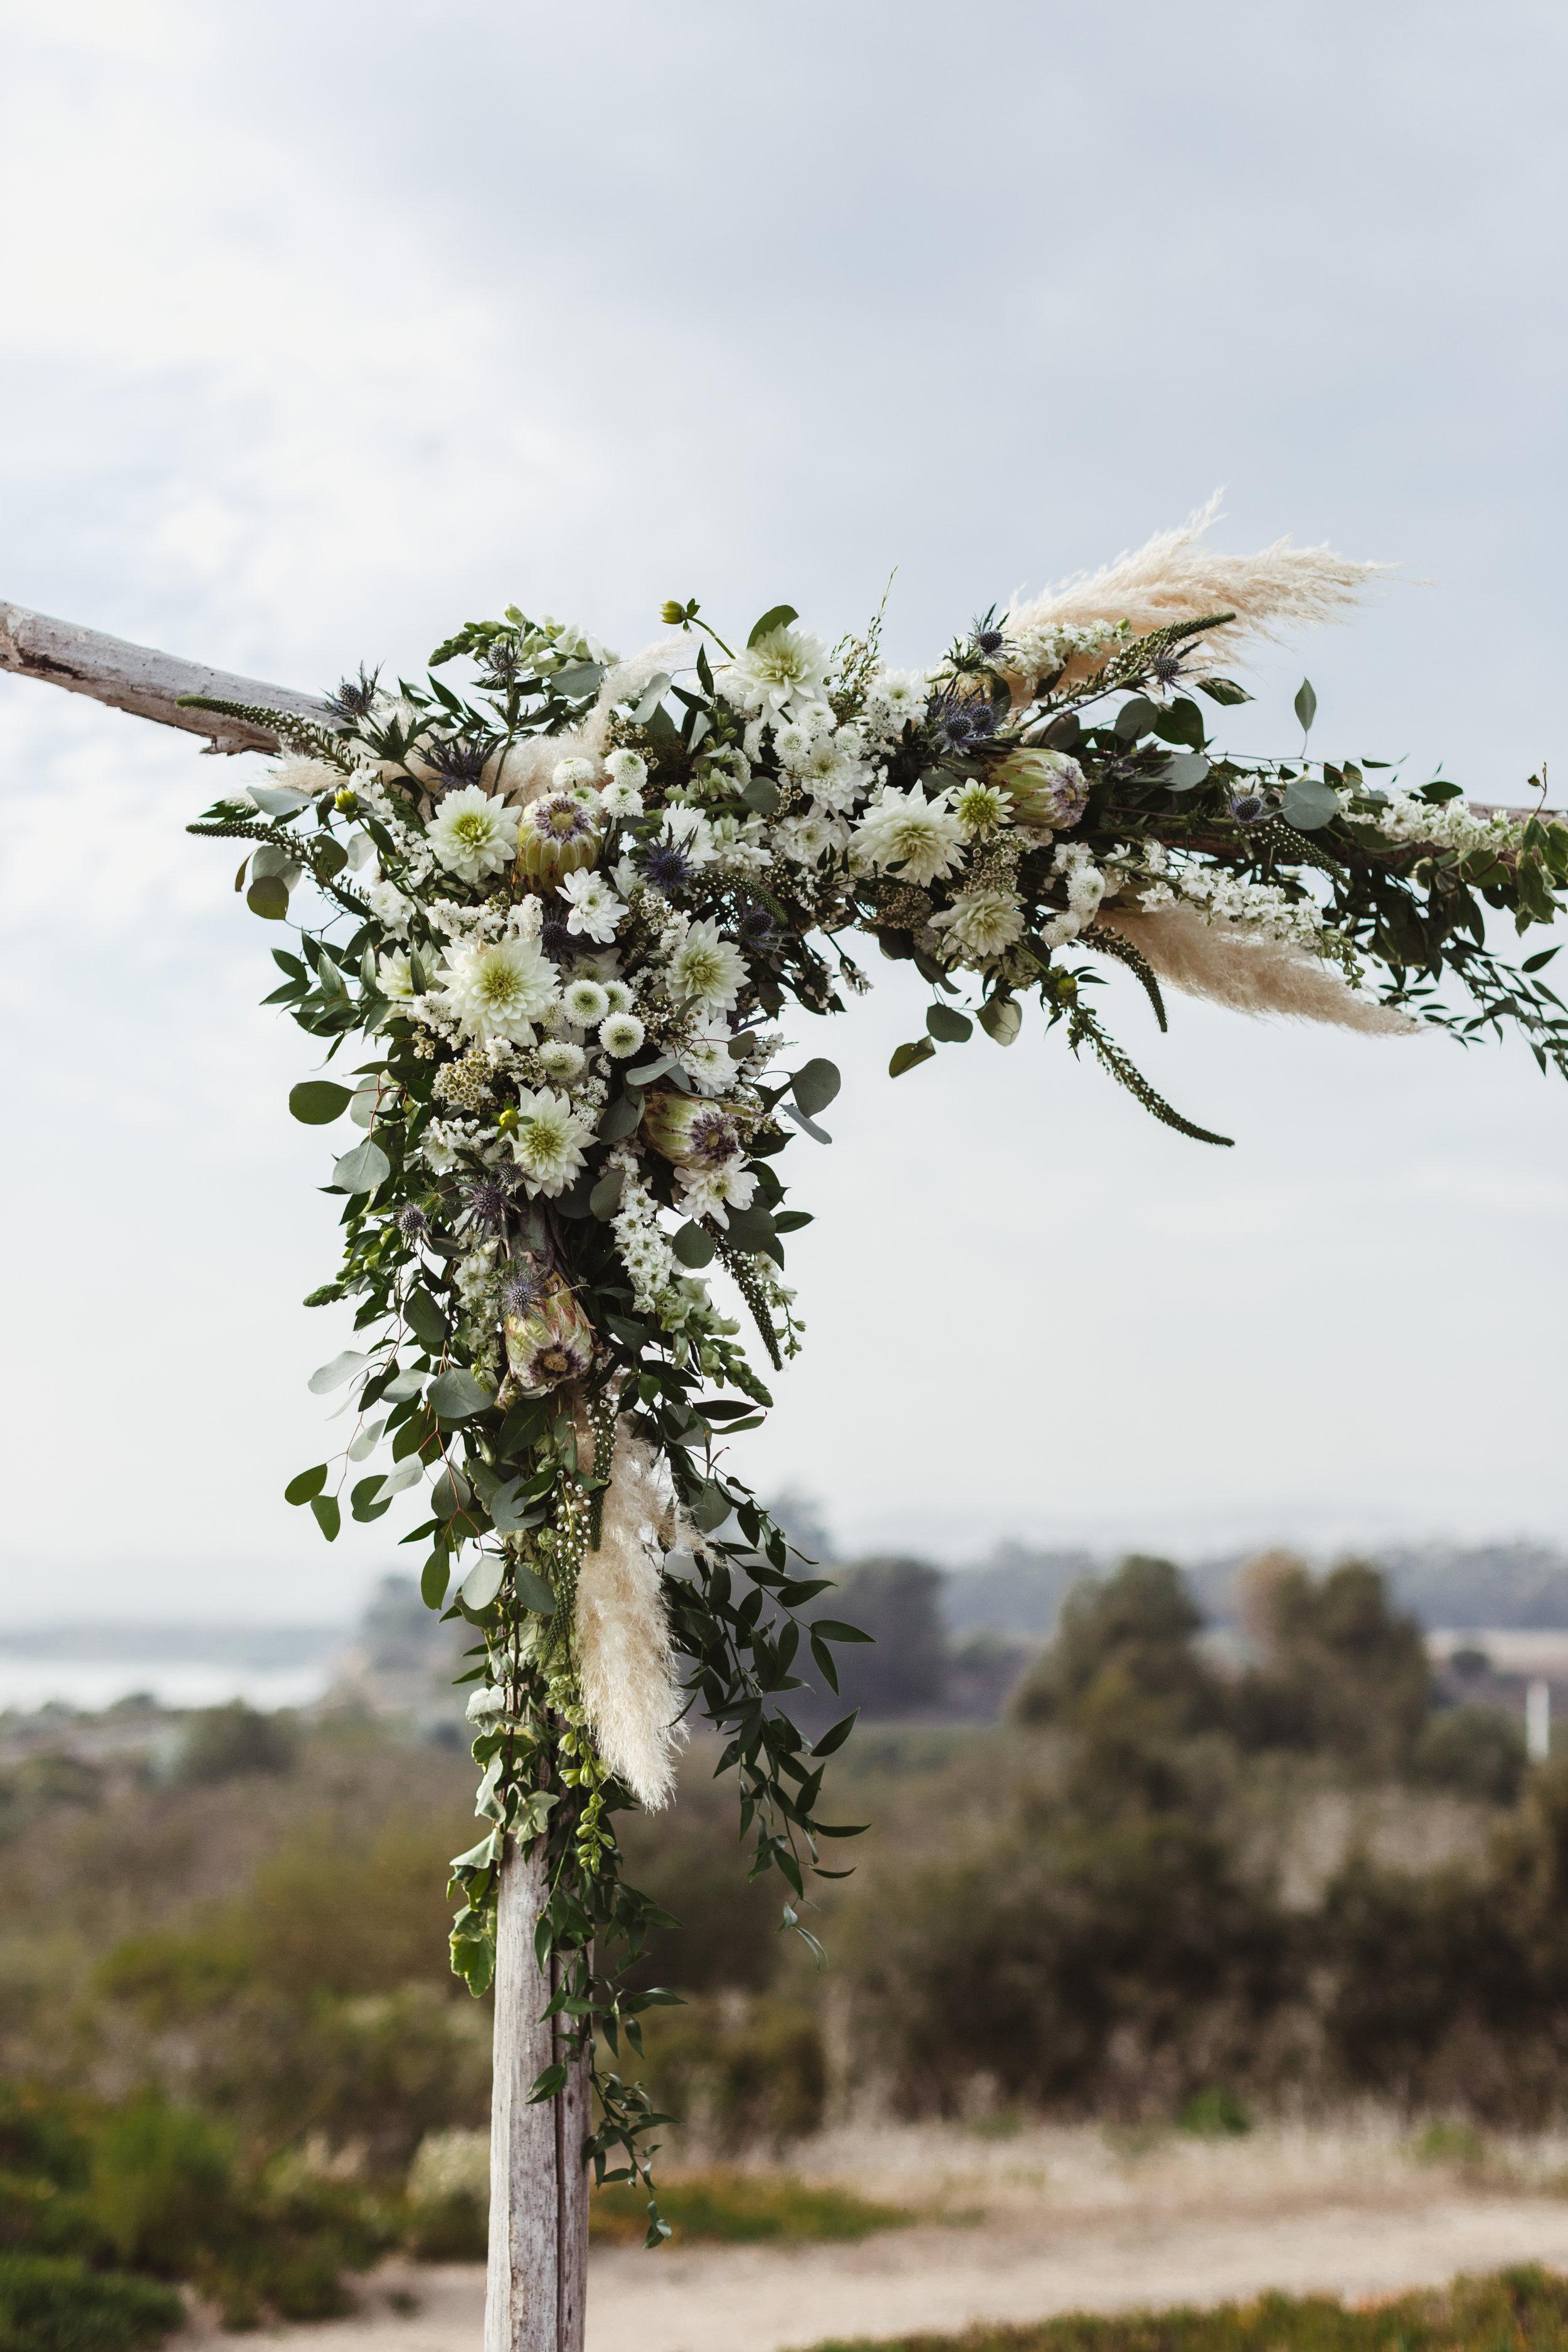 Jamie_English_Photography_JordanErik_Dos_Pueblos_Orchid_Wedding_Santa_Barbara_Fall2018-271.jpg